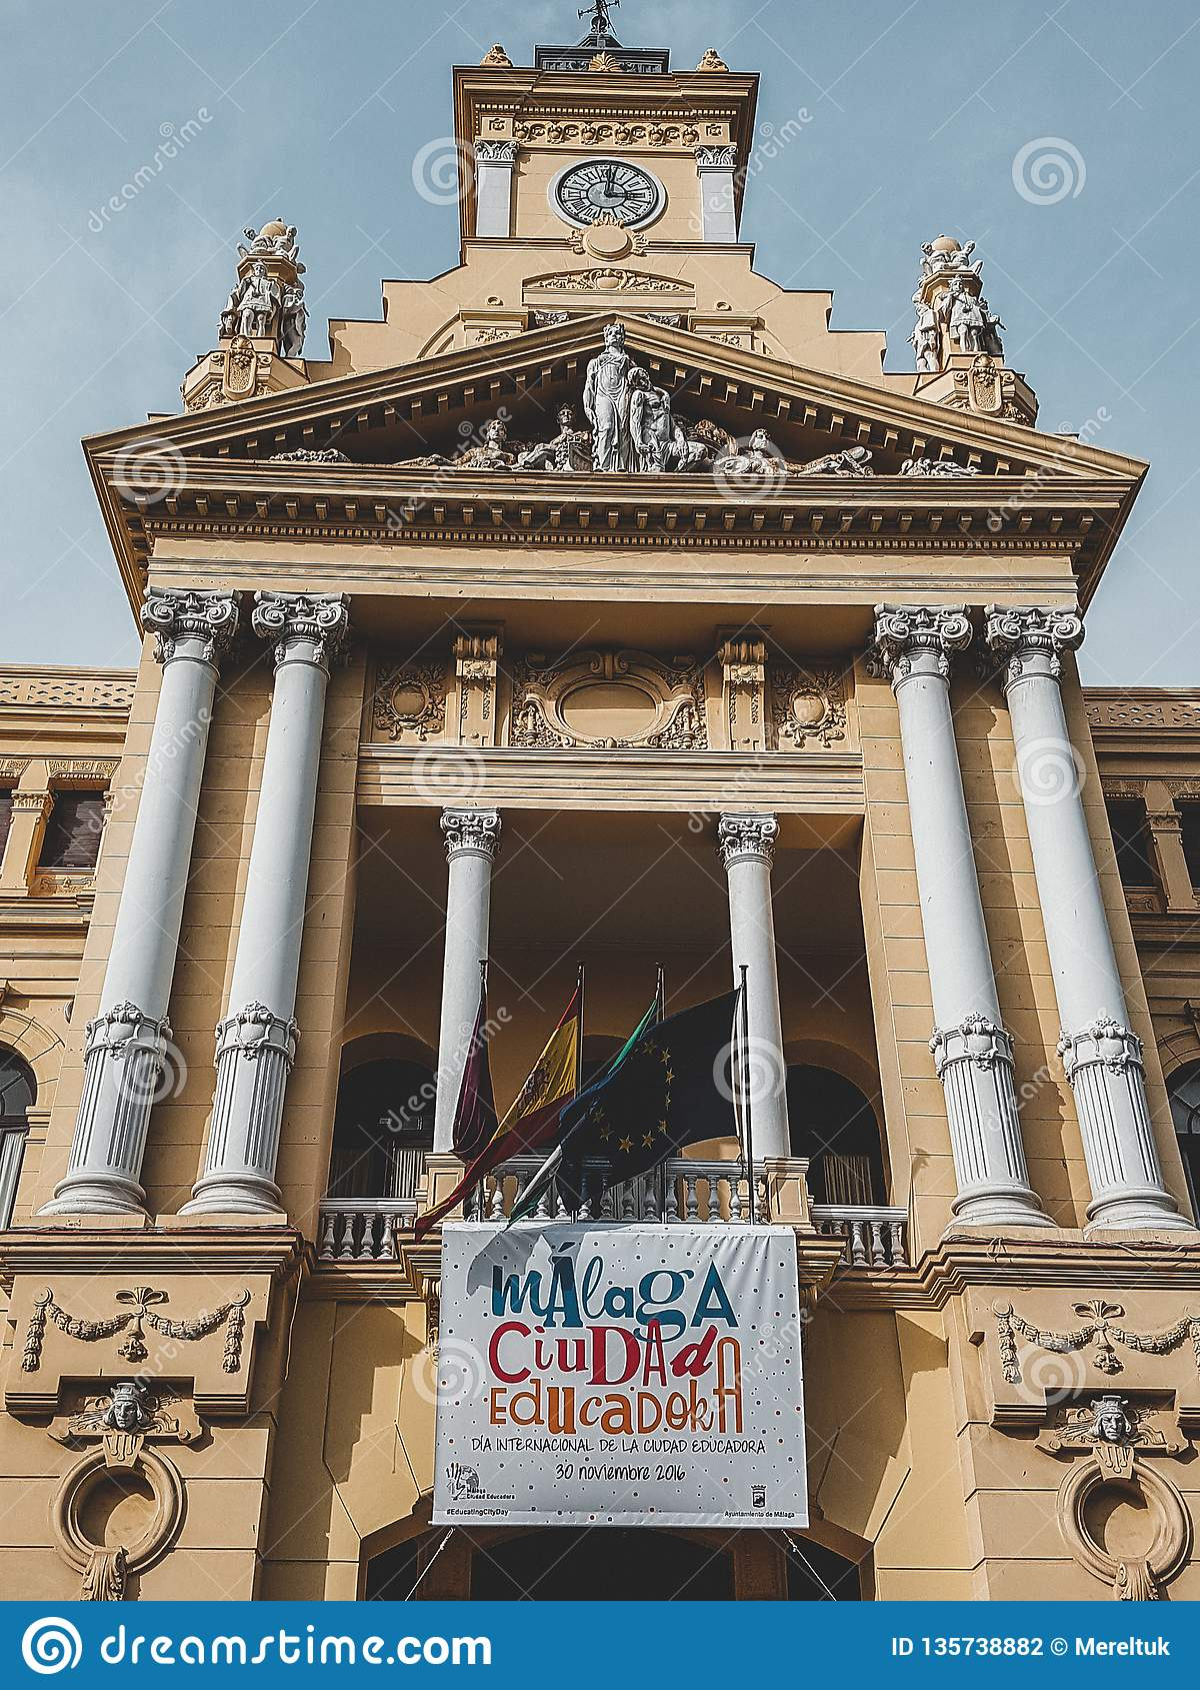 Malaga Espagne a tiré pendant un studytrip